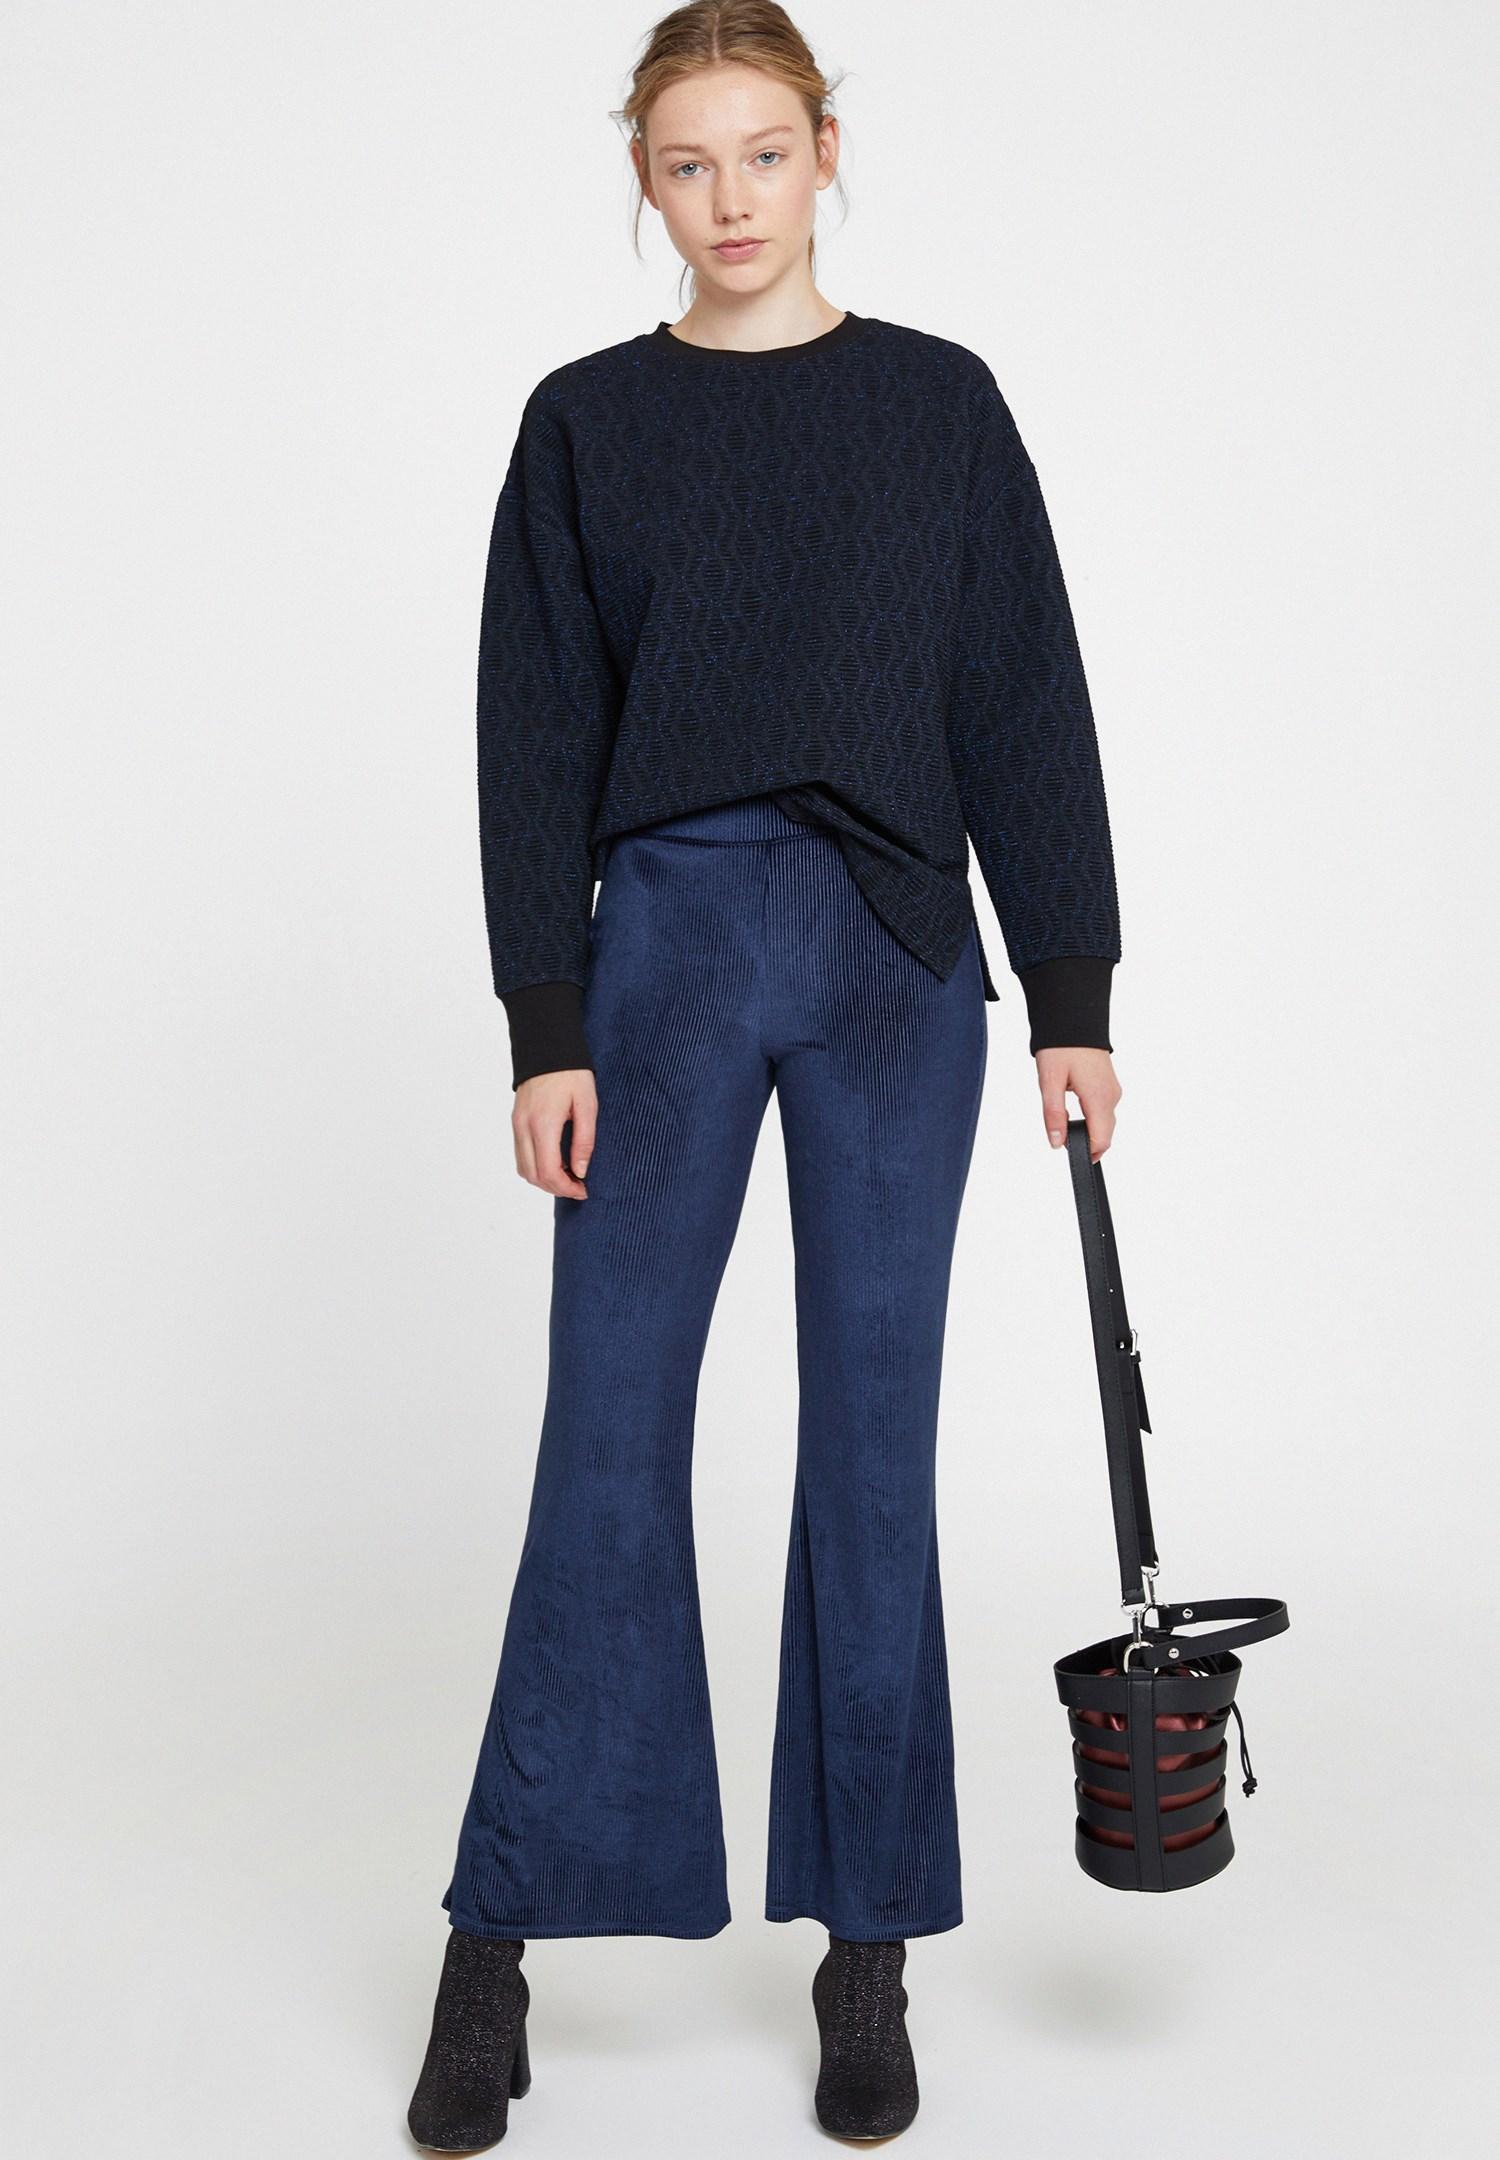 Bayan Çok Renkli Sim Detaylı Sweatshirt